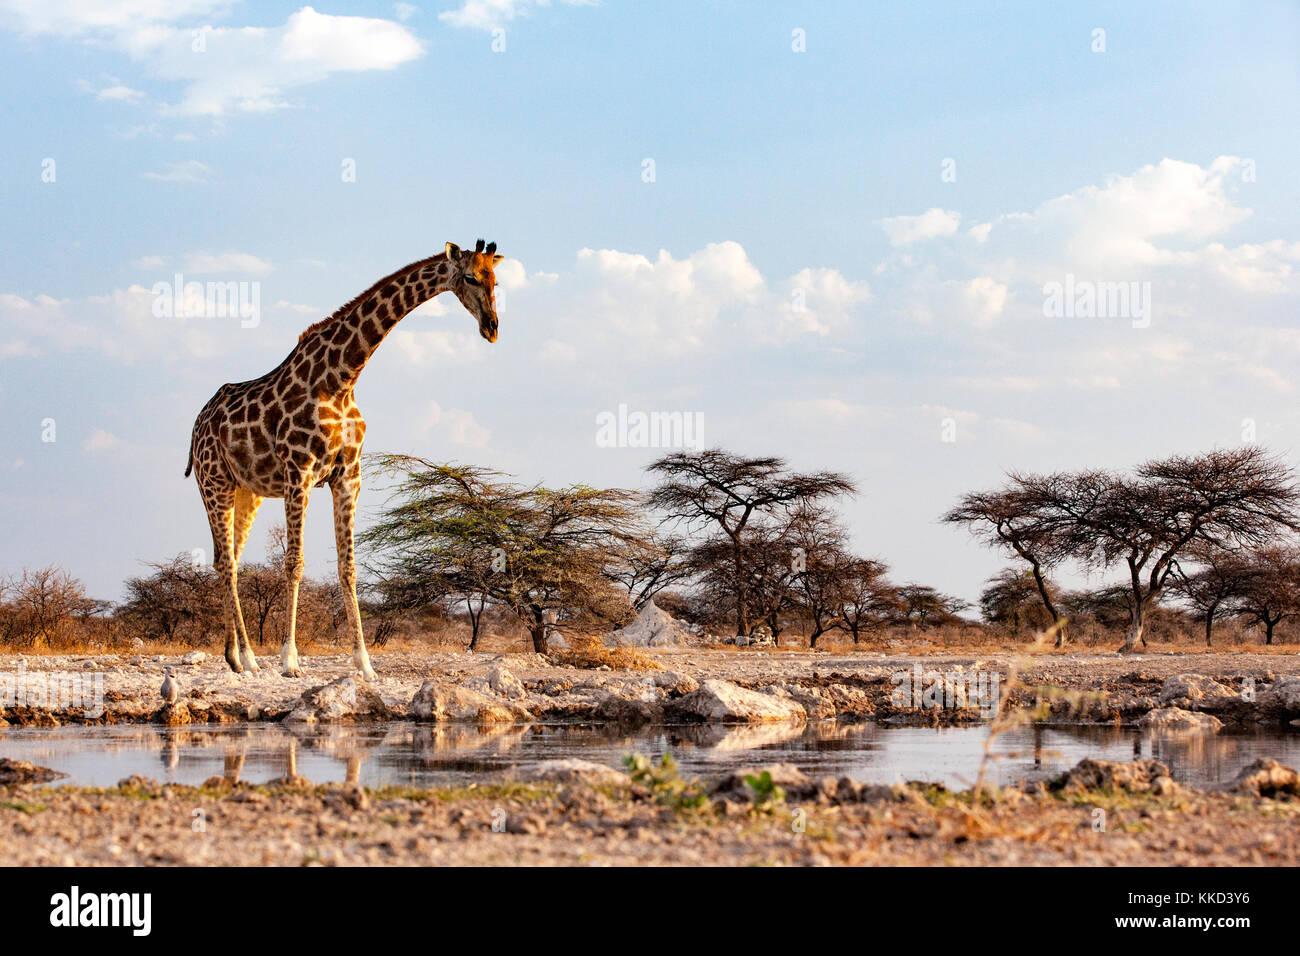 Giraffe at Onkolo Hide, Onguma Game Reserve, Namibia, Africa Stock Photo